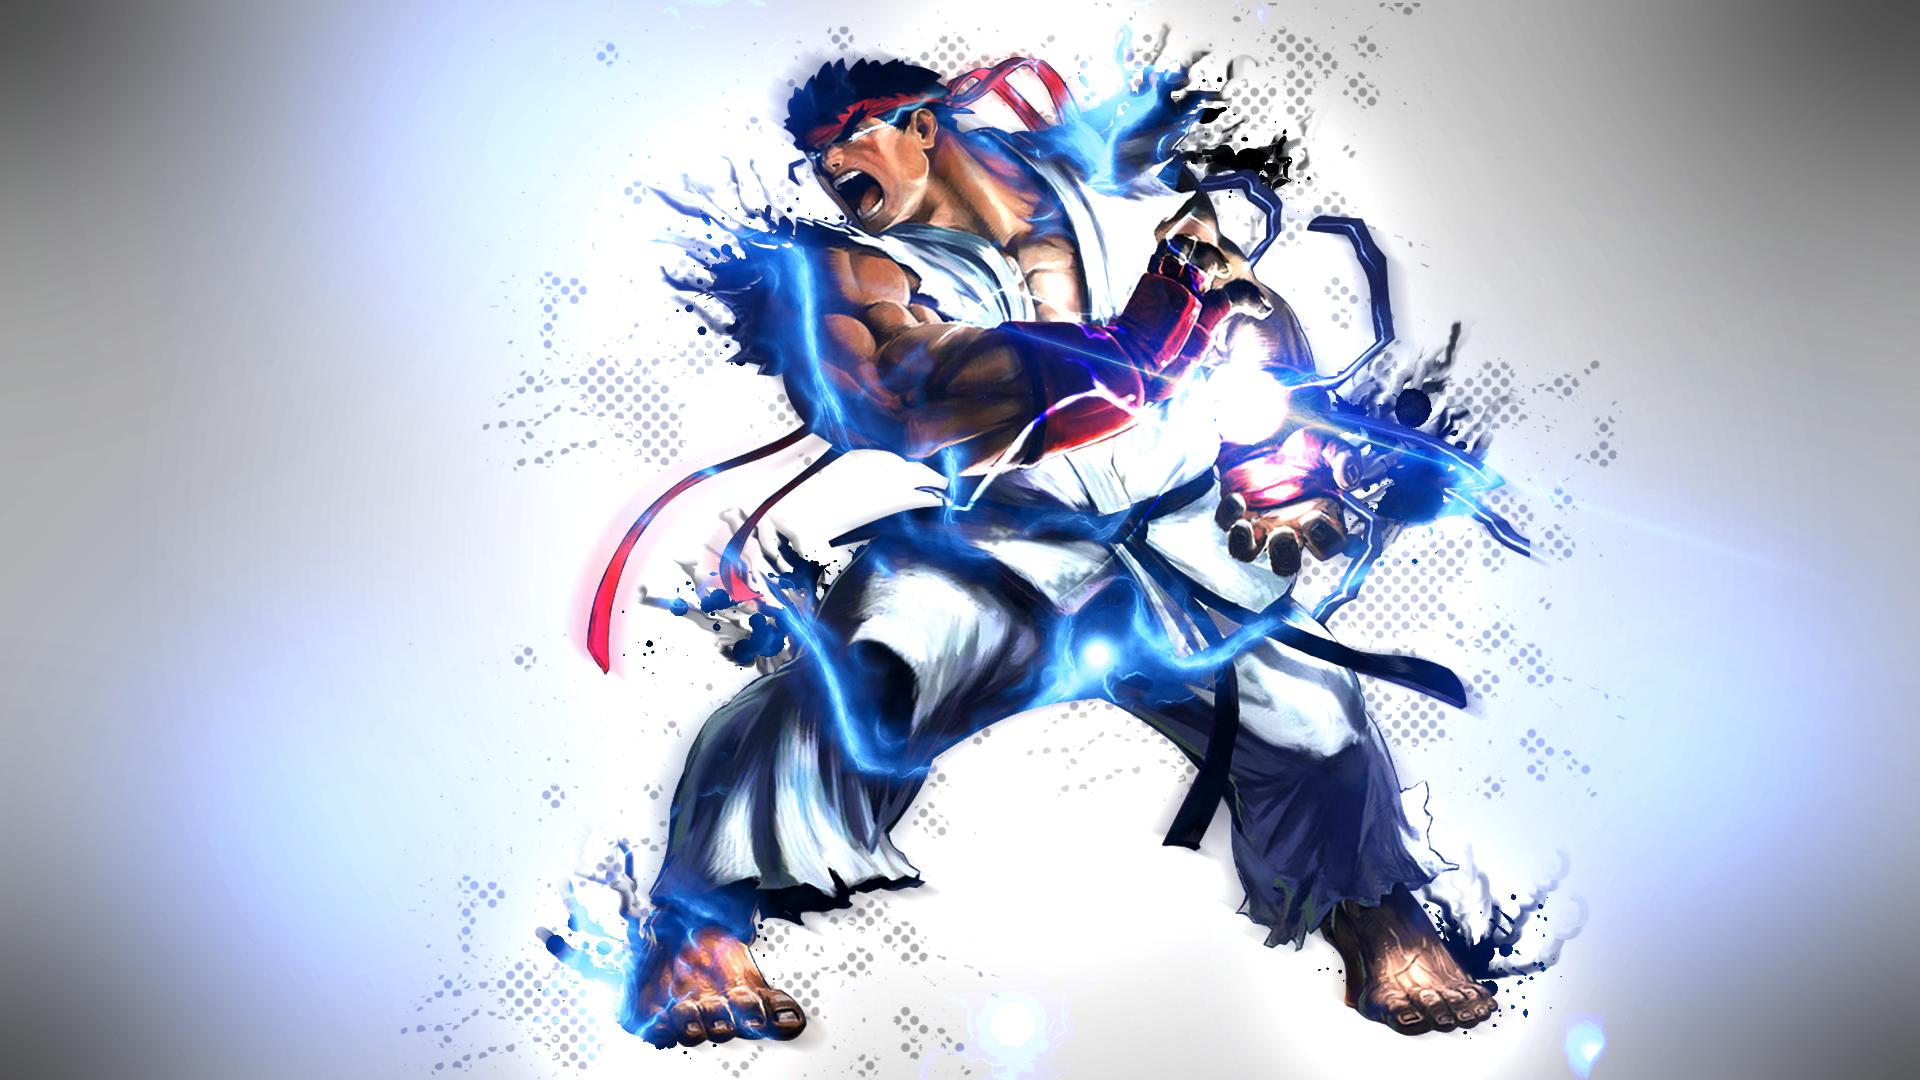 [48+] Ryu Street Fighter Wallpaper on WallpaperSafari